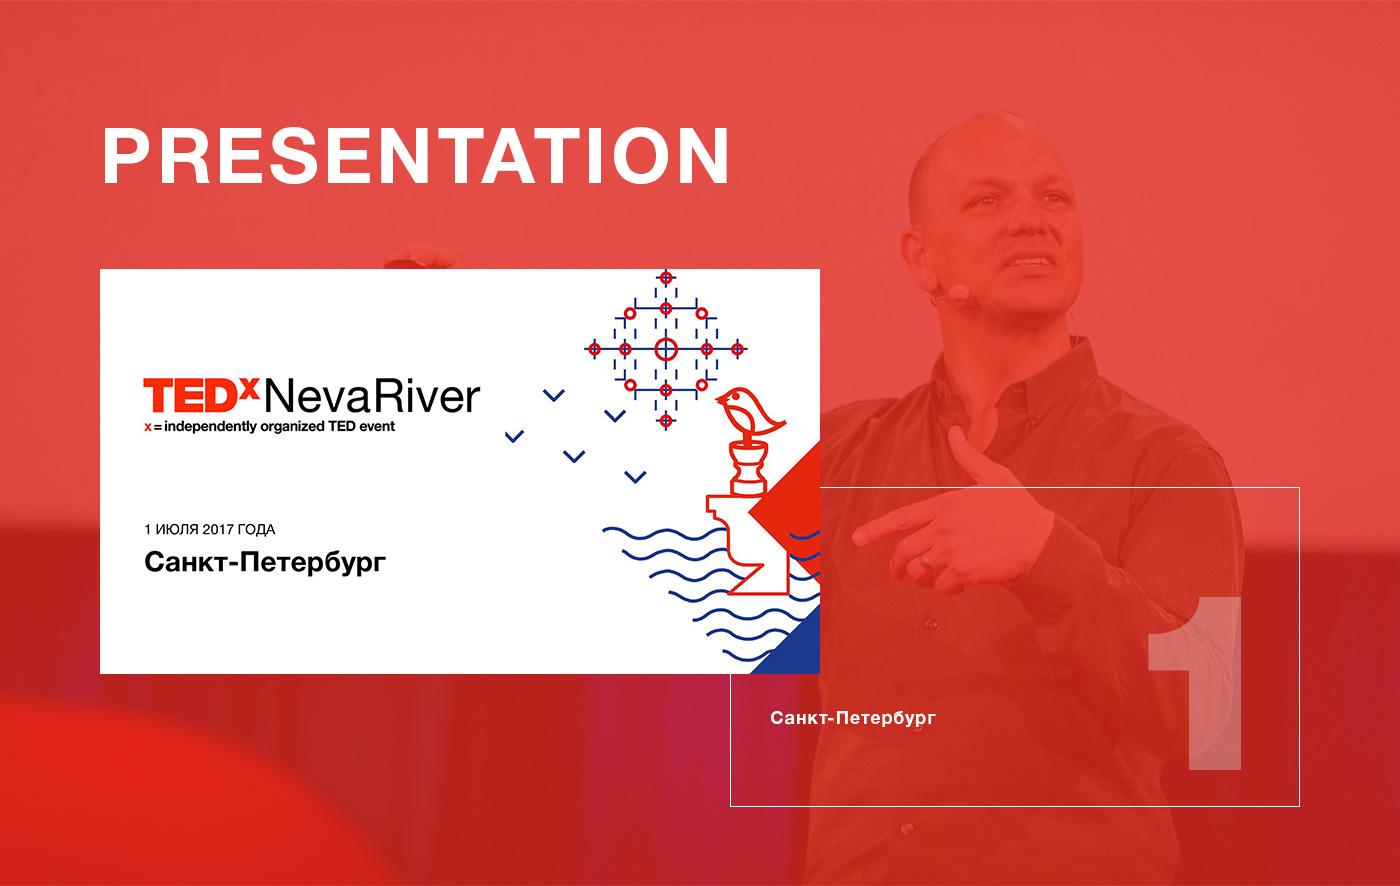 Дизайн презентации для TEDxNevaRiver